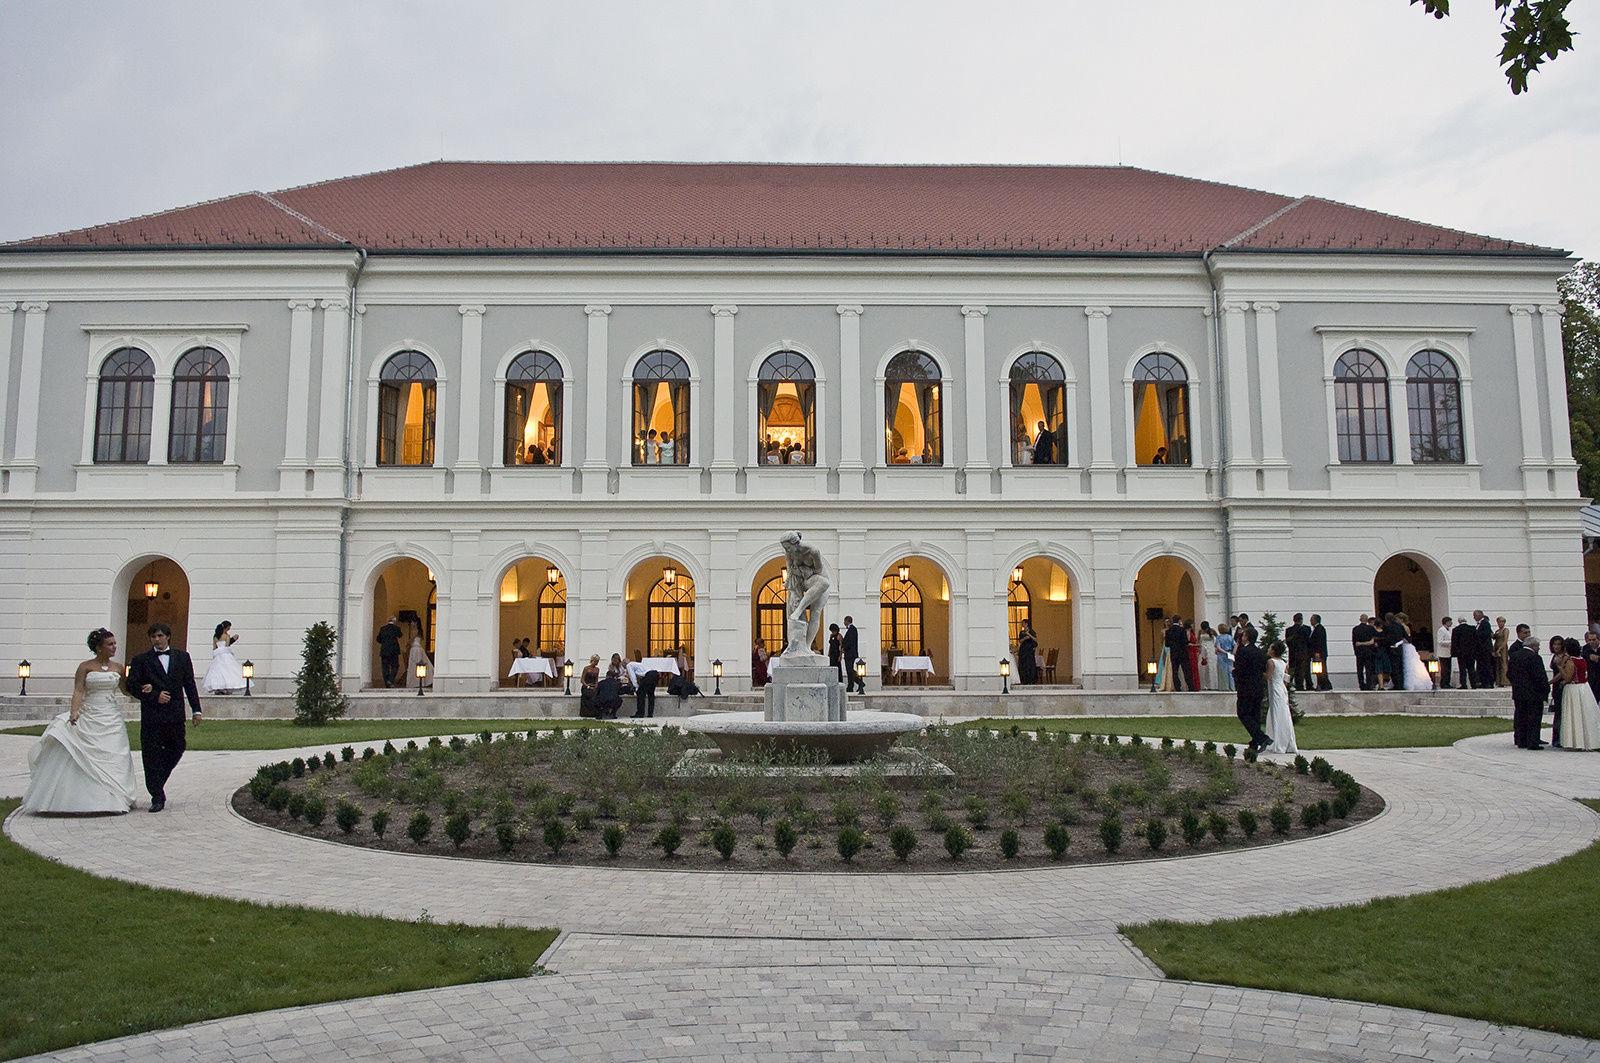 Anna Grand Hotel Wine&Vital Balatonfüred - Díszterem díszkerttel